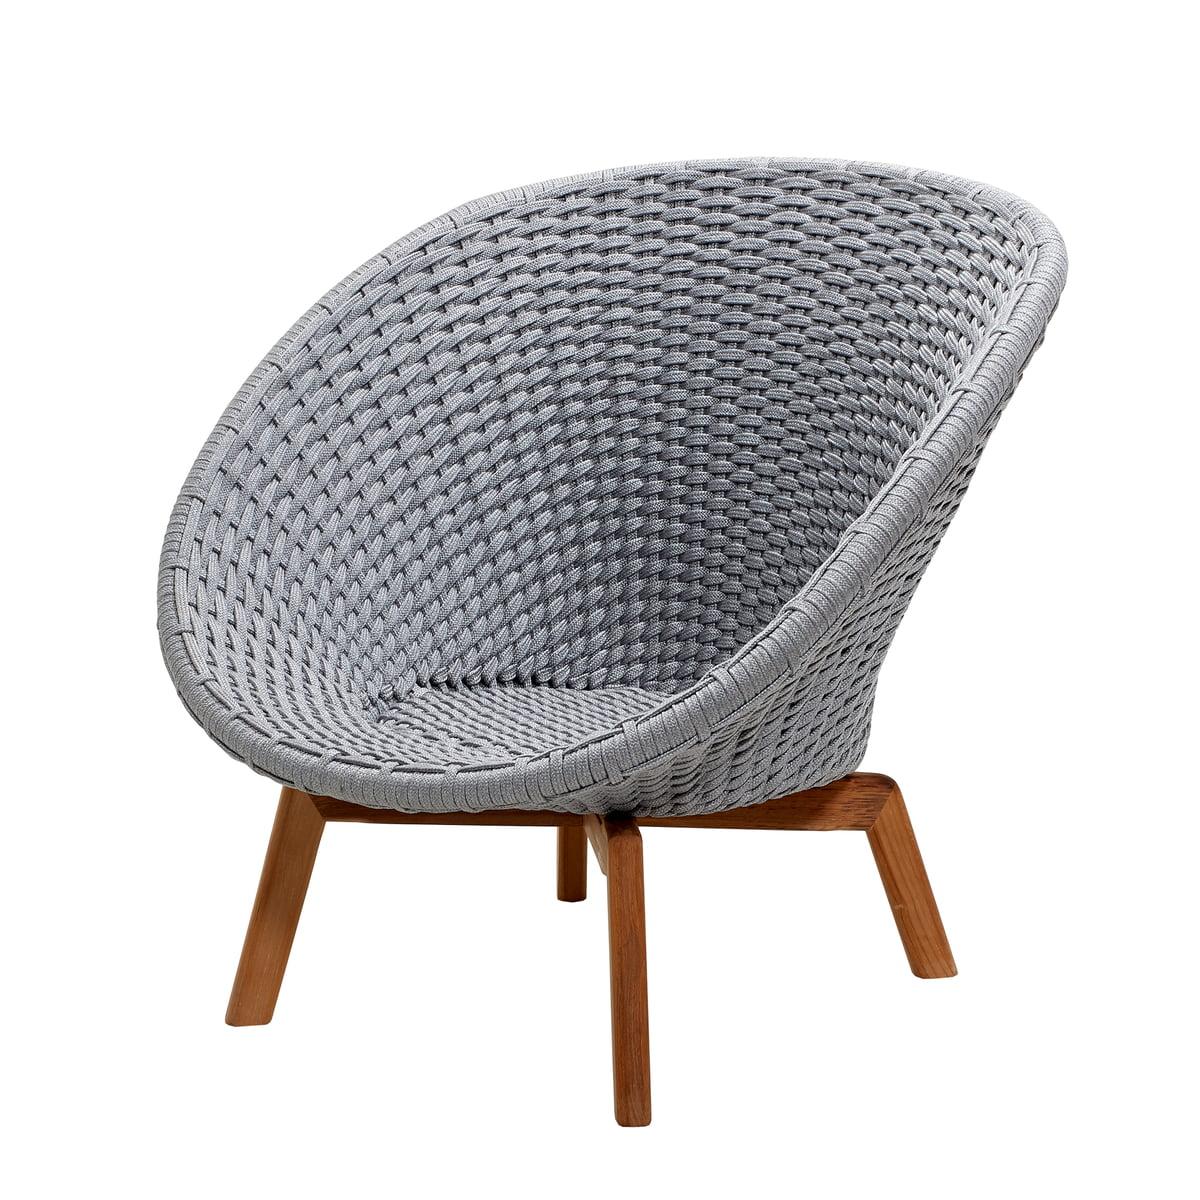 Cane-line - Peacock Lounge Sessel (5458), Teak / hellgrau